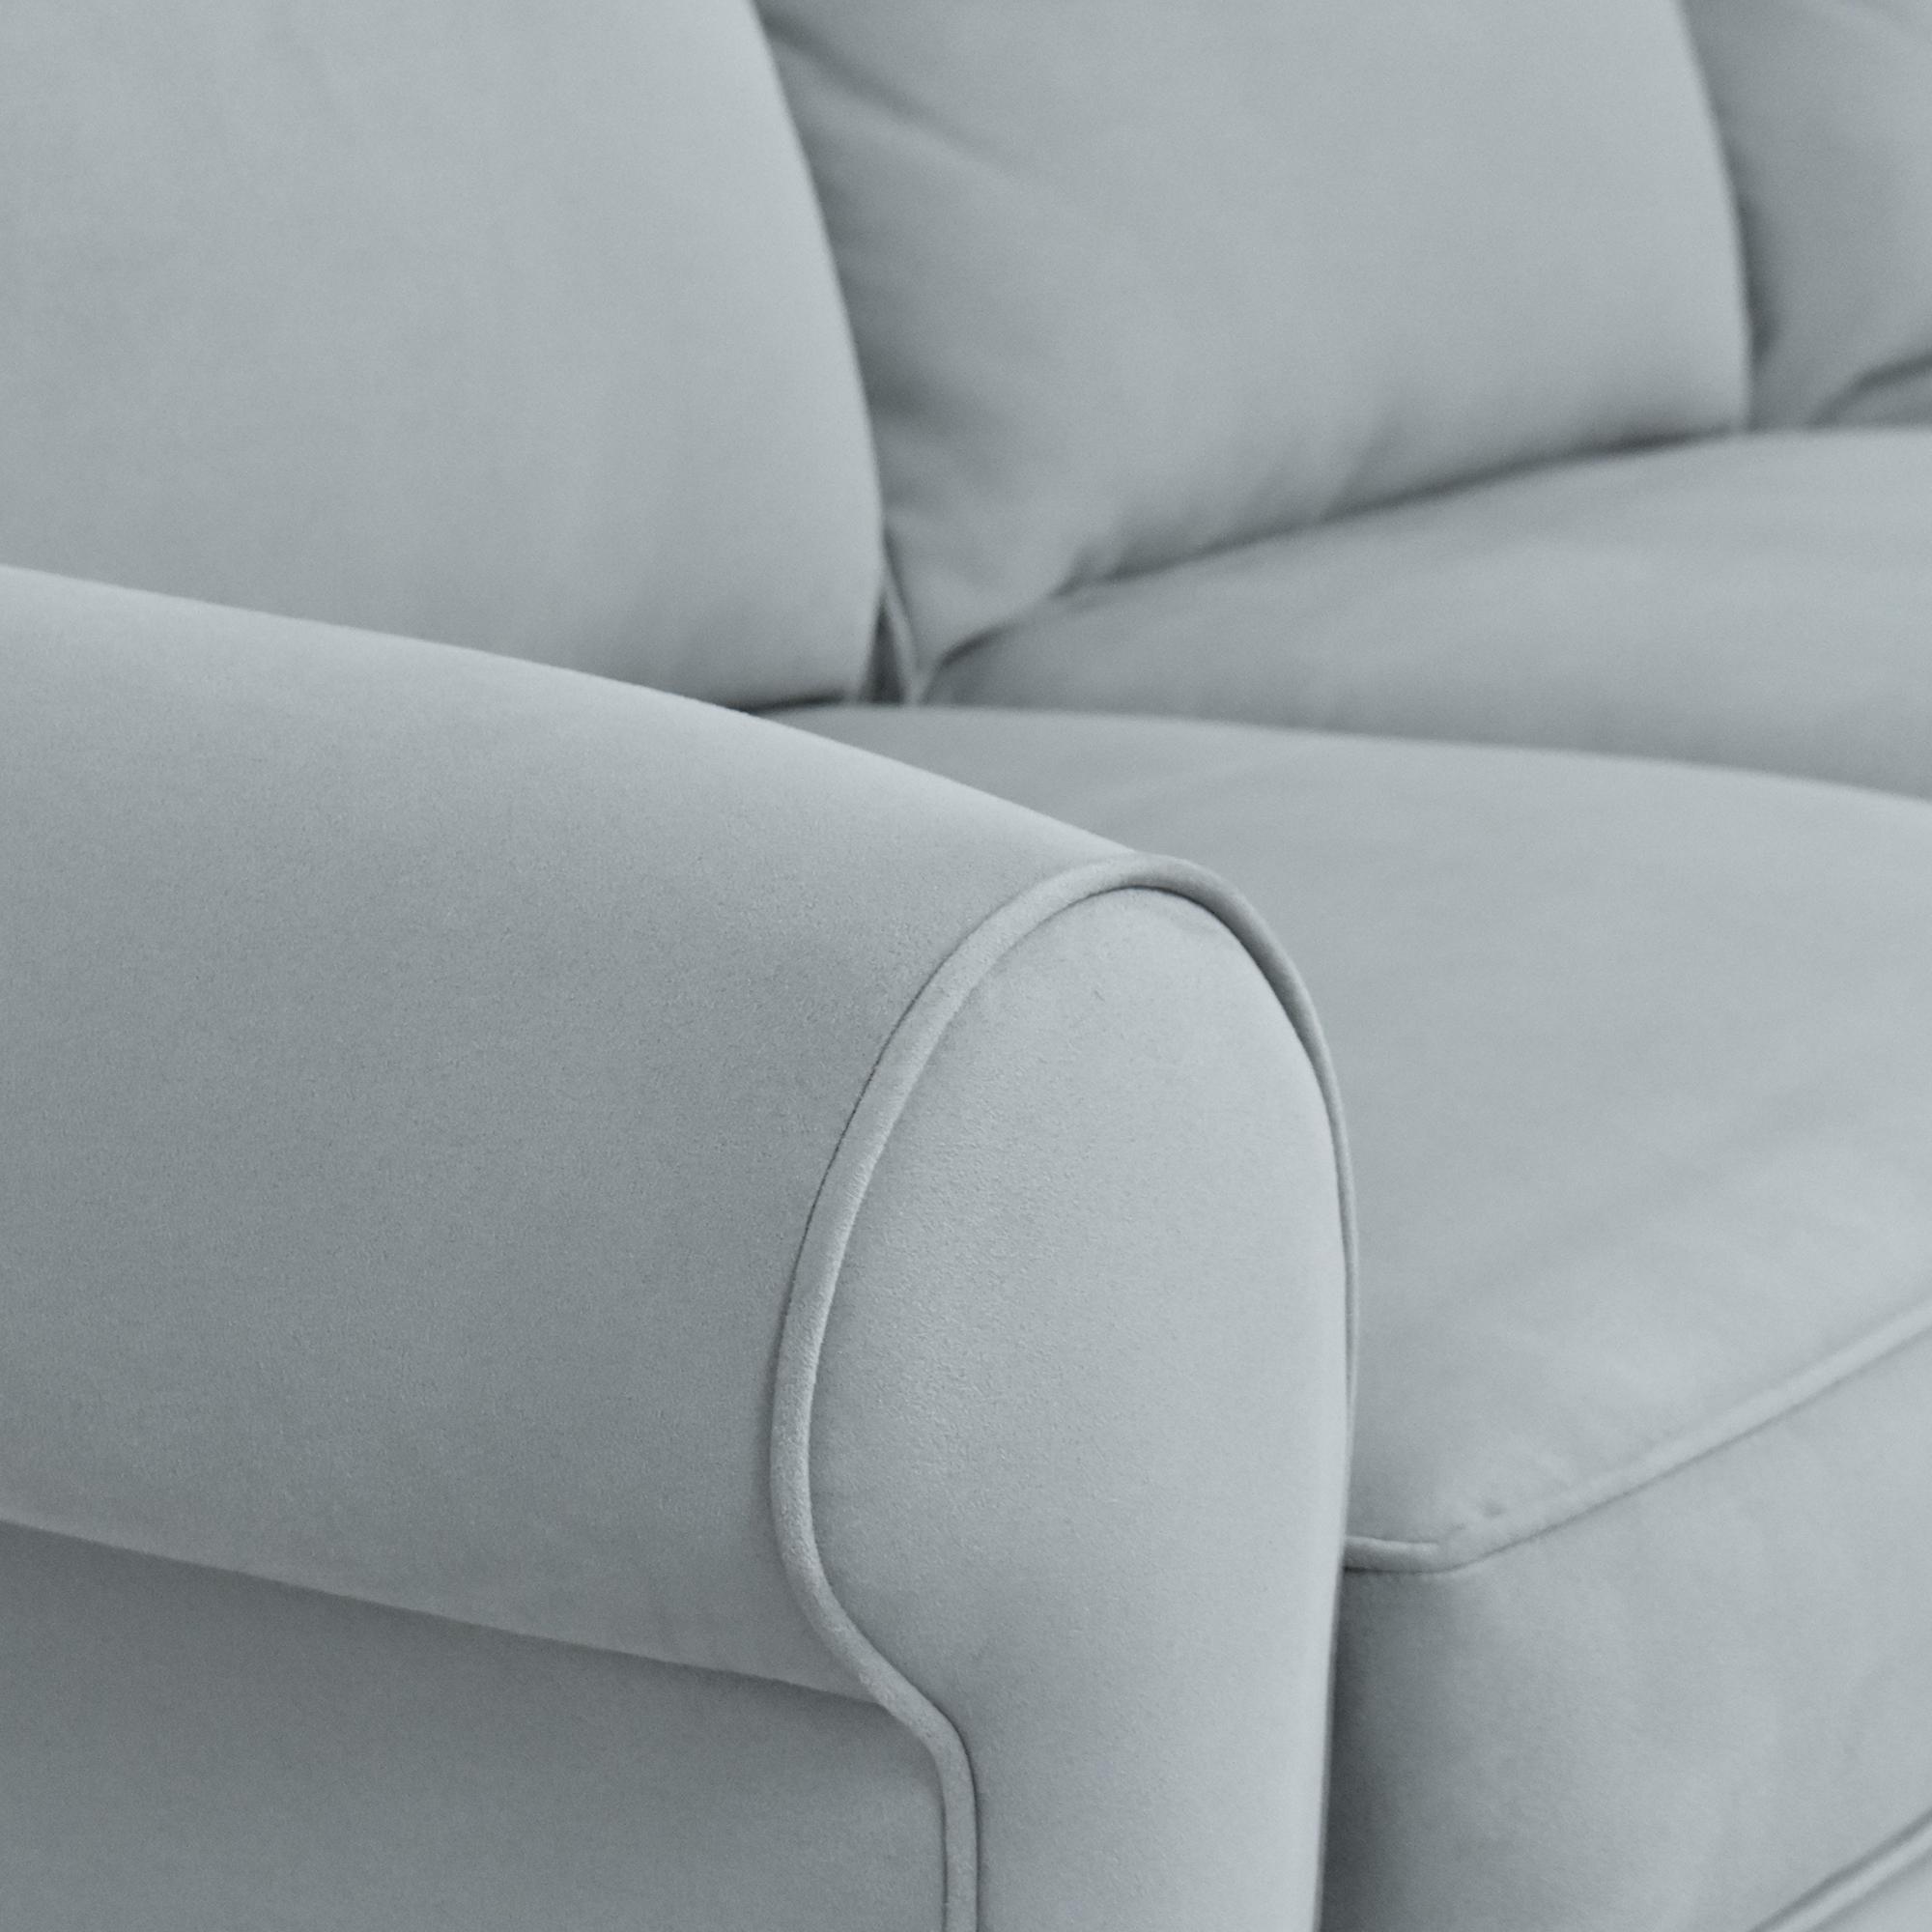 buy Raymour & Flanigan Raymour & Flanigan Cindy Crawford Home Roll Arm Sofa online